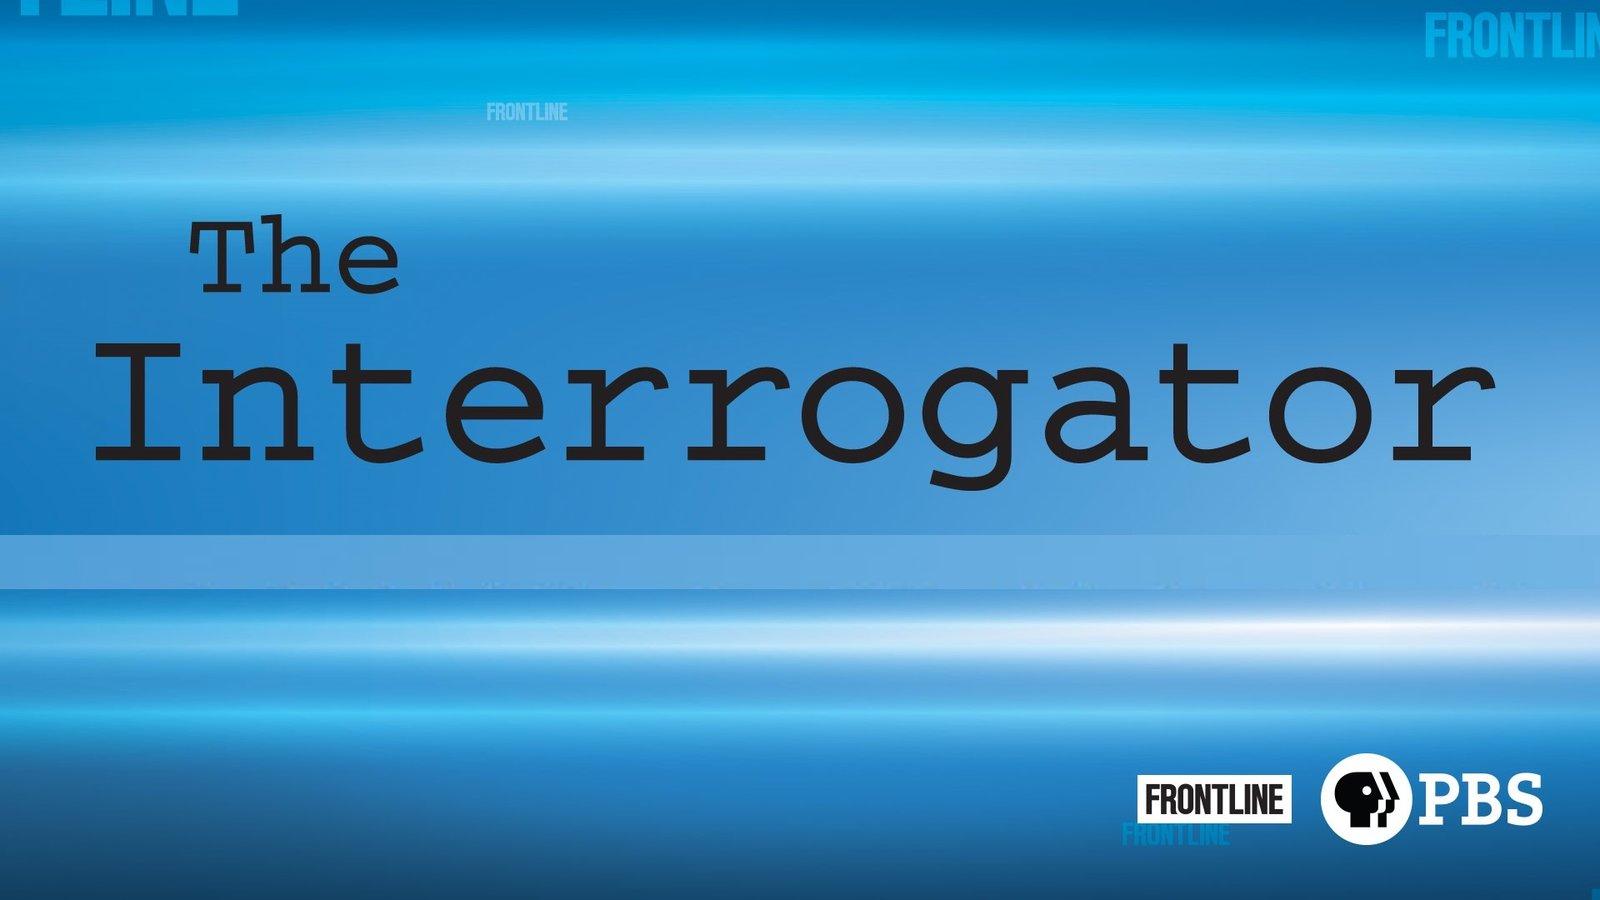 Frontline: The Interrogator